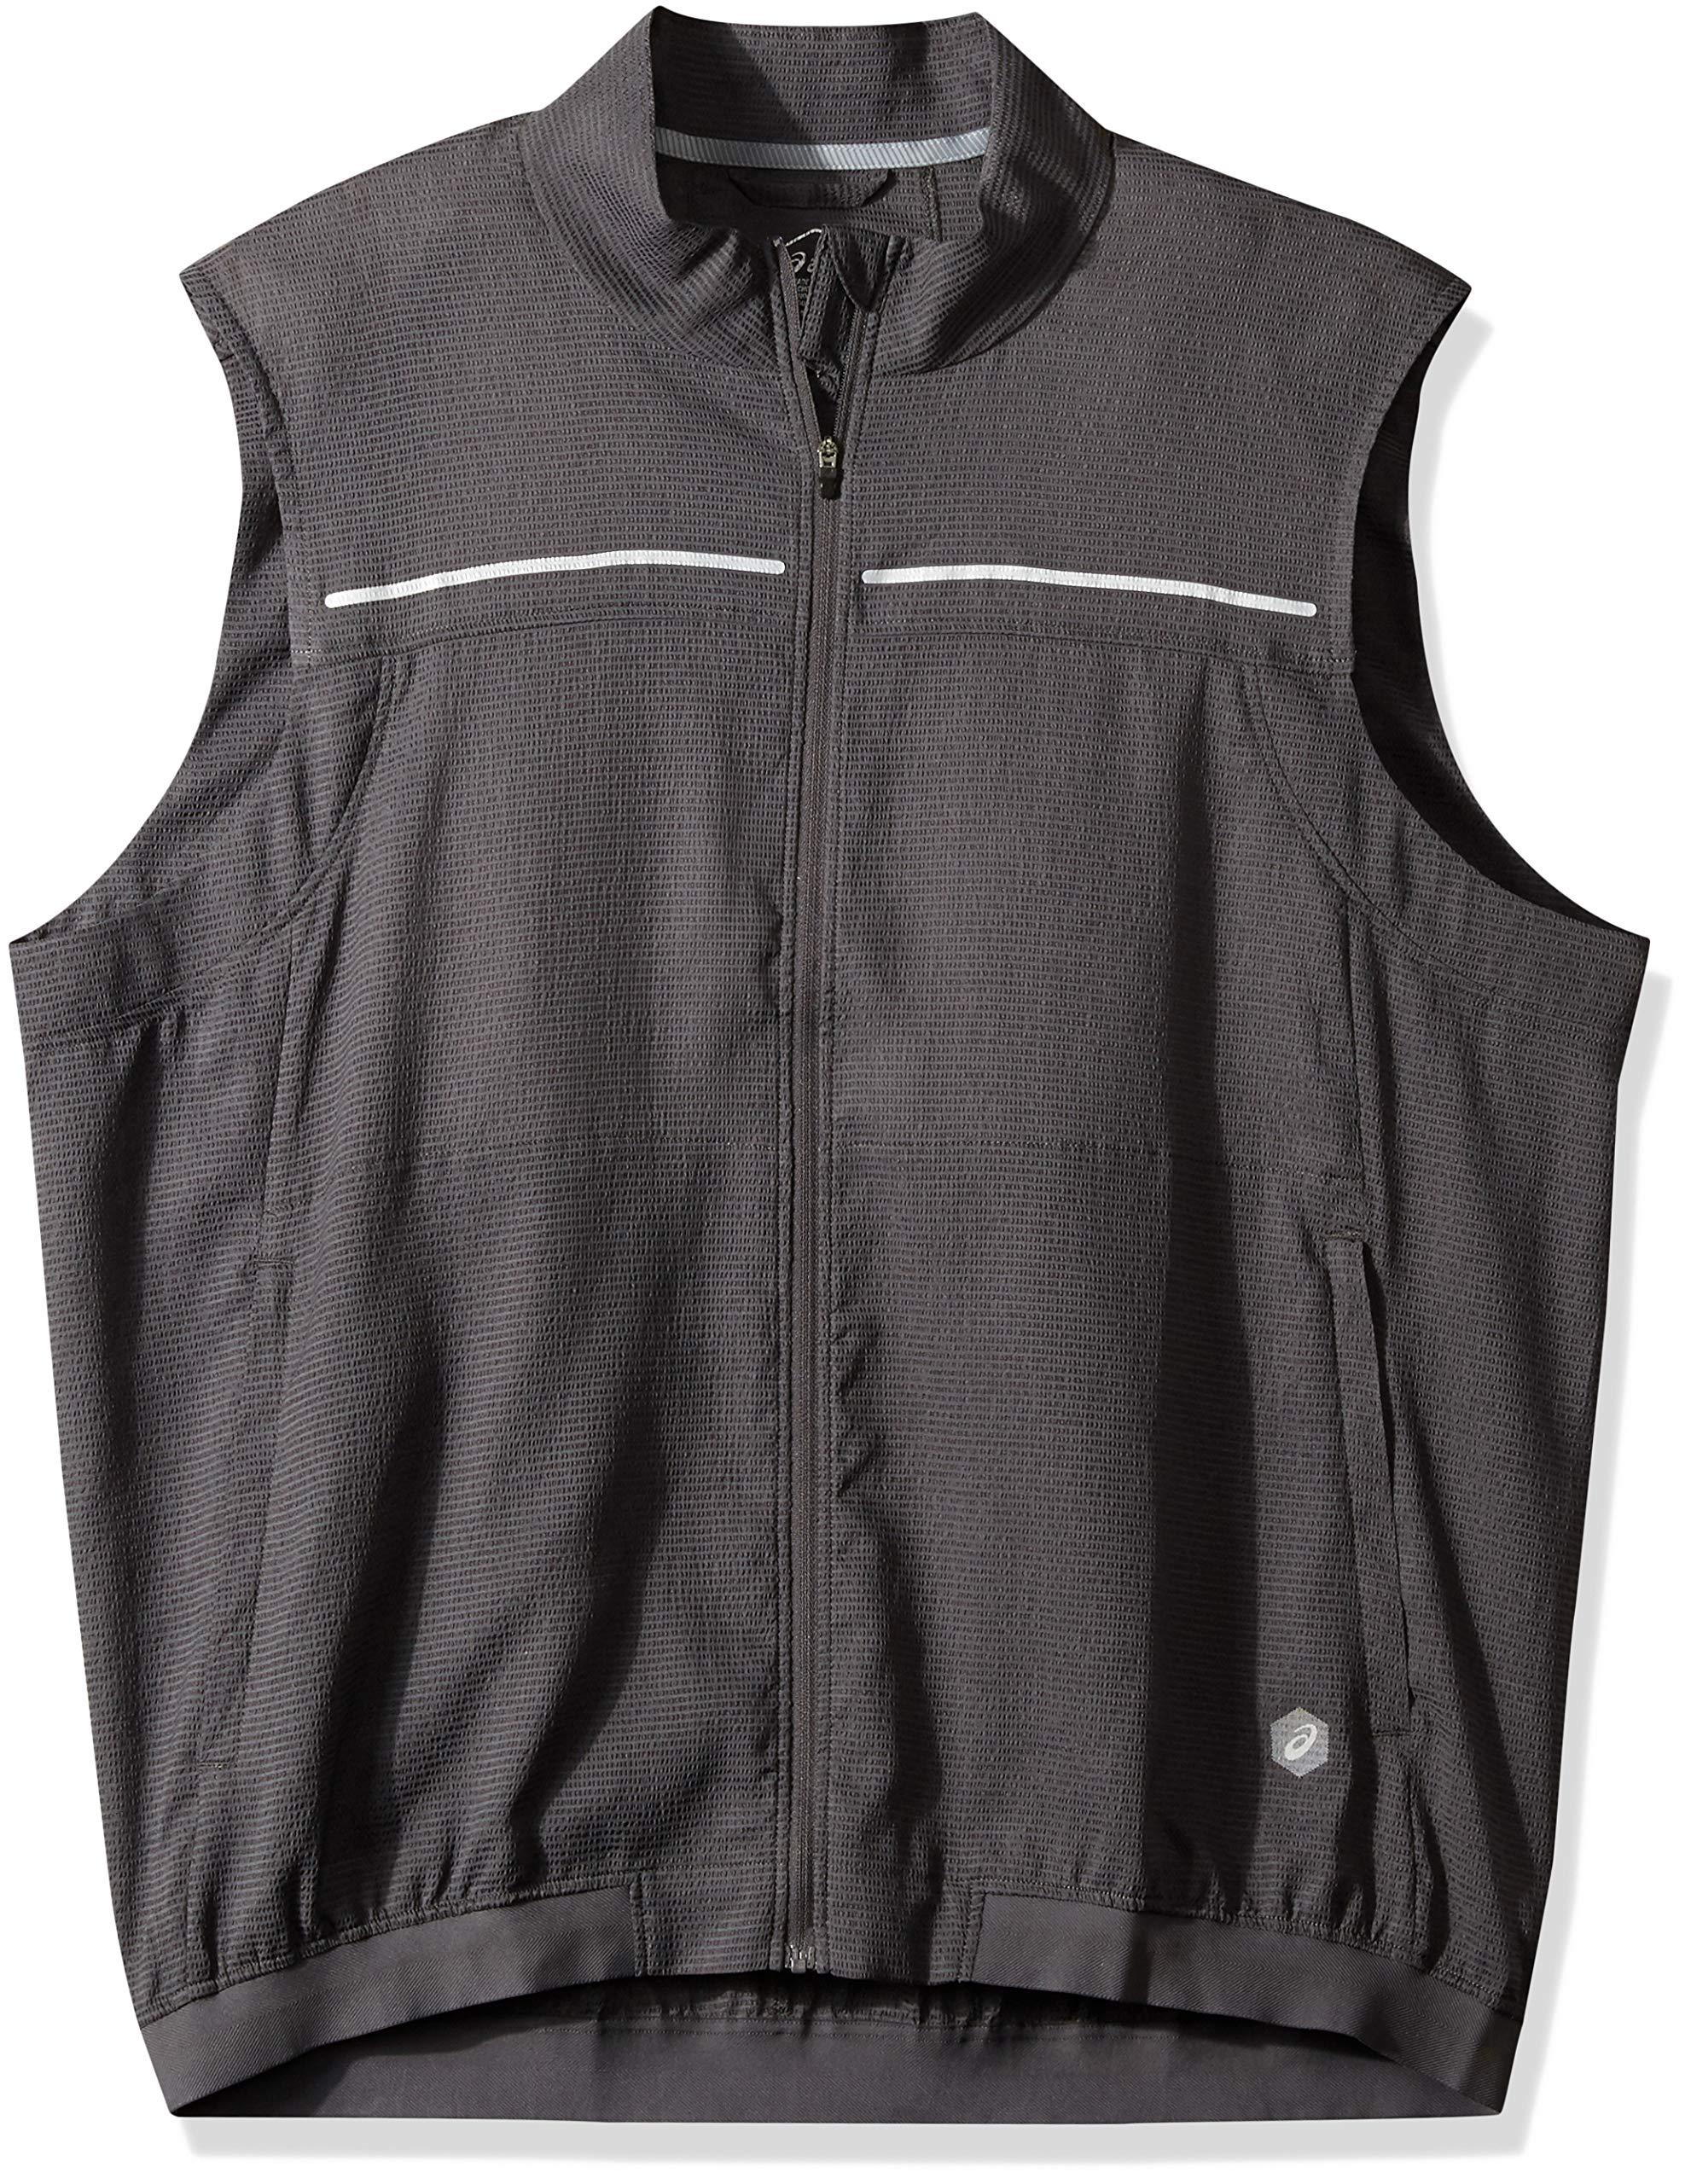 ASICS Men' Lite-Show Vest, Dark Grey, Small